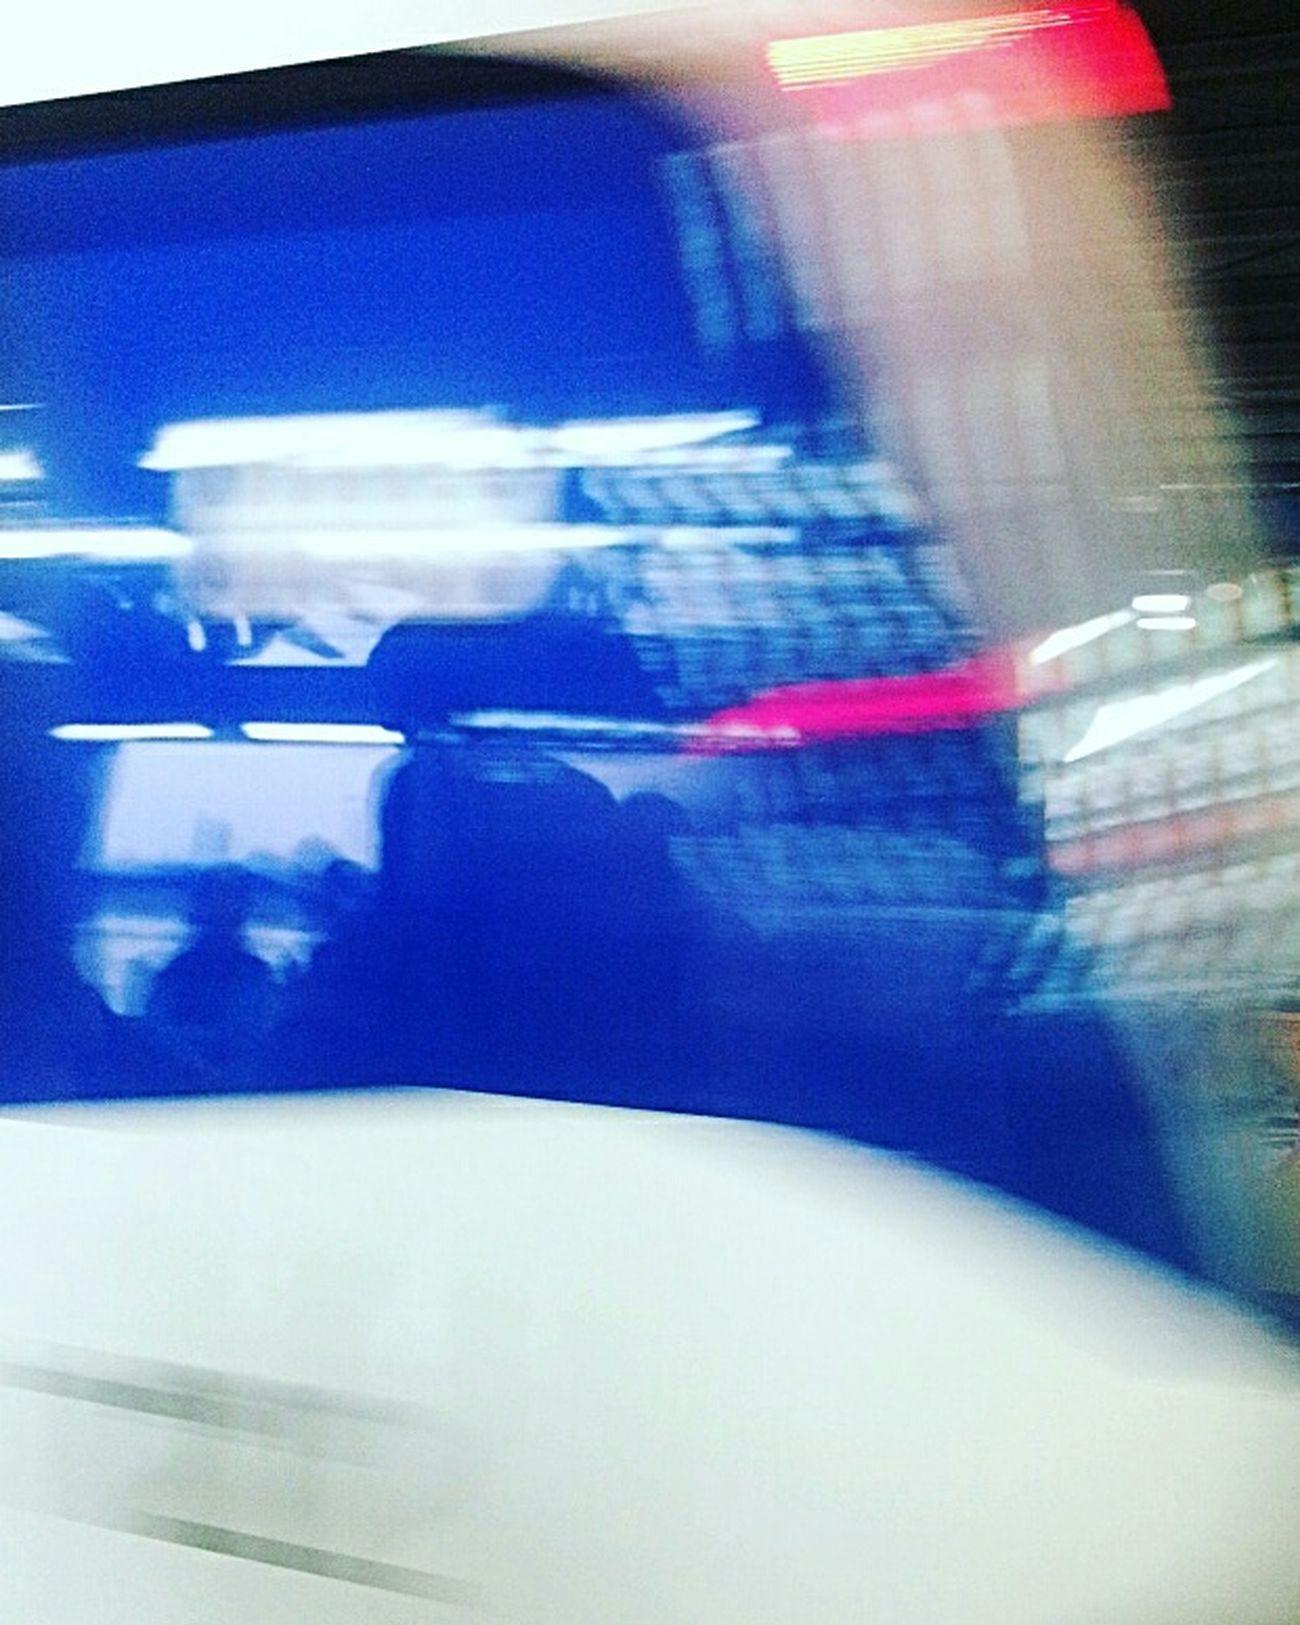 The Street Photographer - 2016 EyeEm Awards Streetphotography Street Photography AMPt AMPt_community AMPt Community Open Edit AMPt - Street Colors Streetphoto_color Streetphoto_colour Capture The Moment 2016 EyeEm Awards Fresh On Eyeem  Eyeem Photo EyeEm Best Shots capturing motion Speed Showcase November Rush Hour